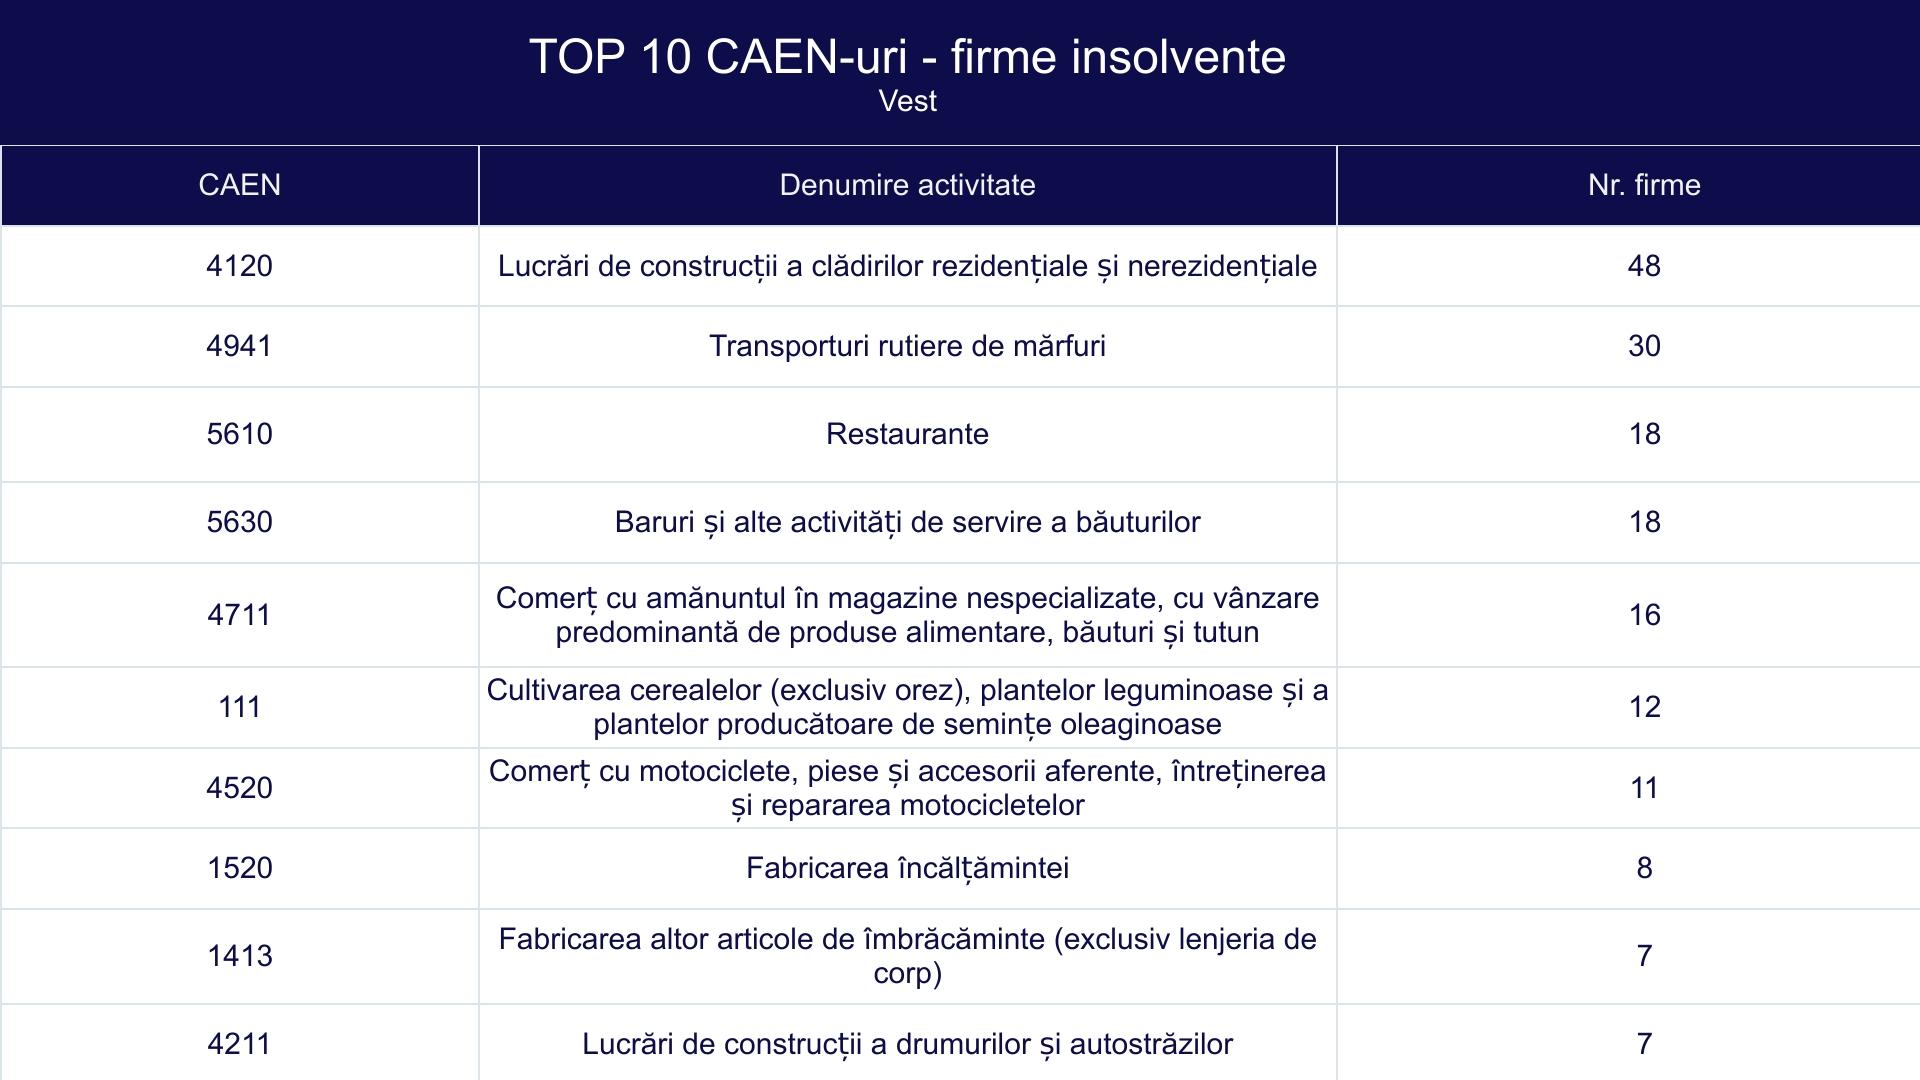 TOP 10 CAEN-uri - firme insolvente -Vest